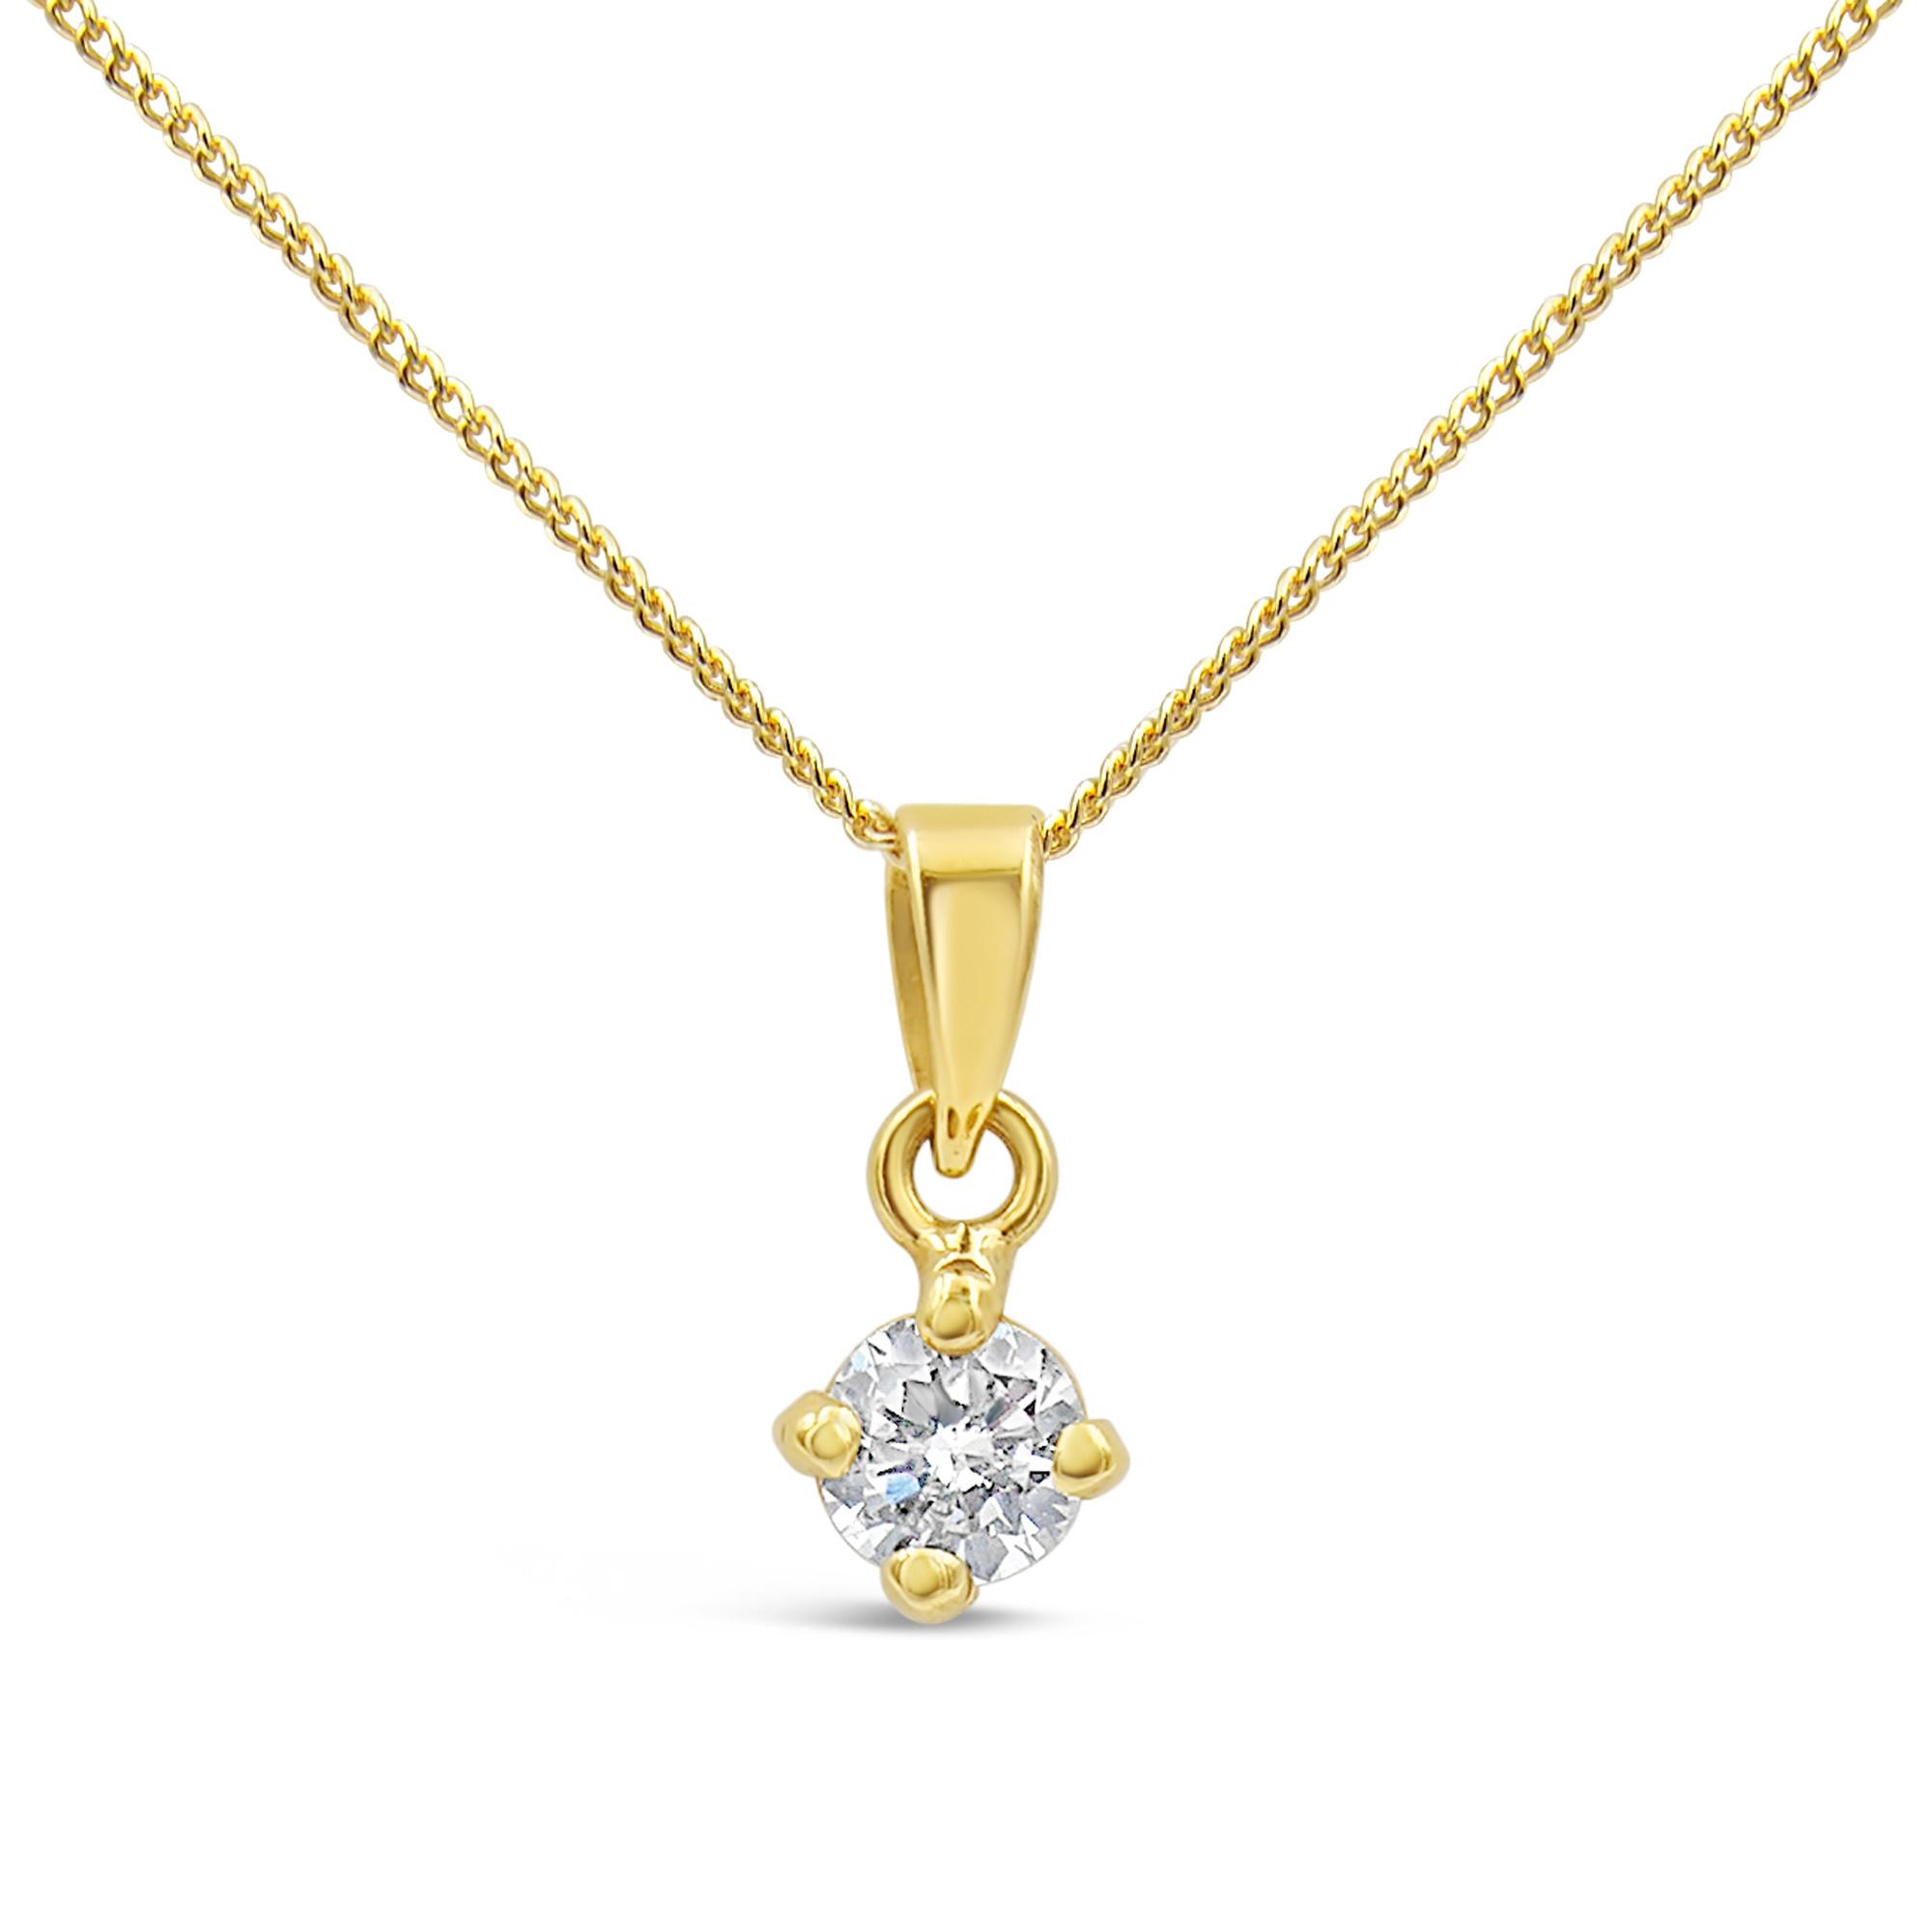 18 karat yellow gold pendant with 0.40 ct diamond